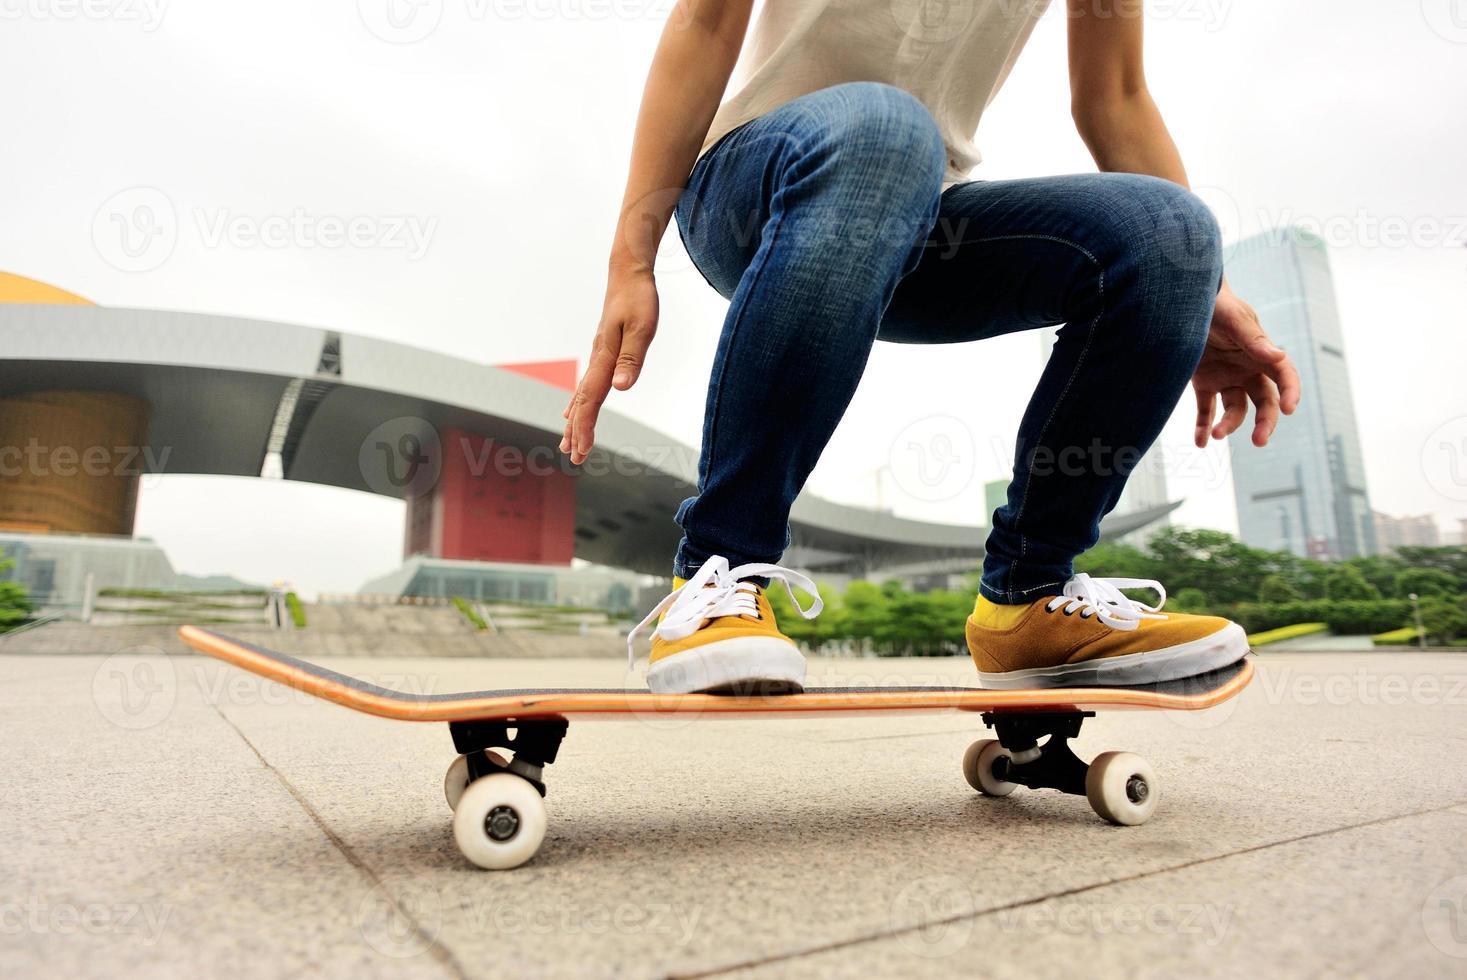 Skateboard Frau foto